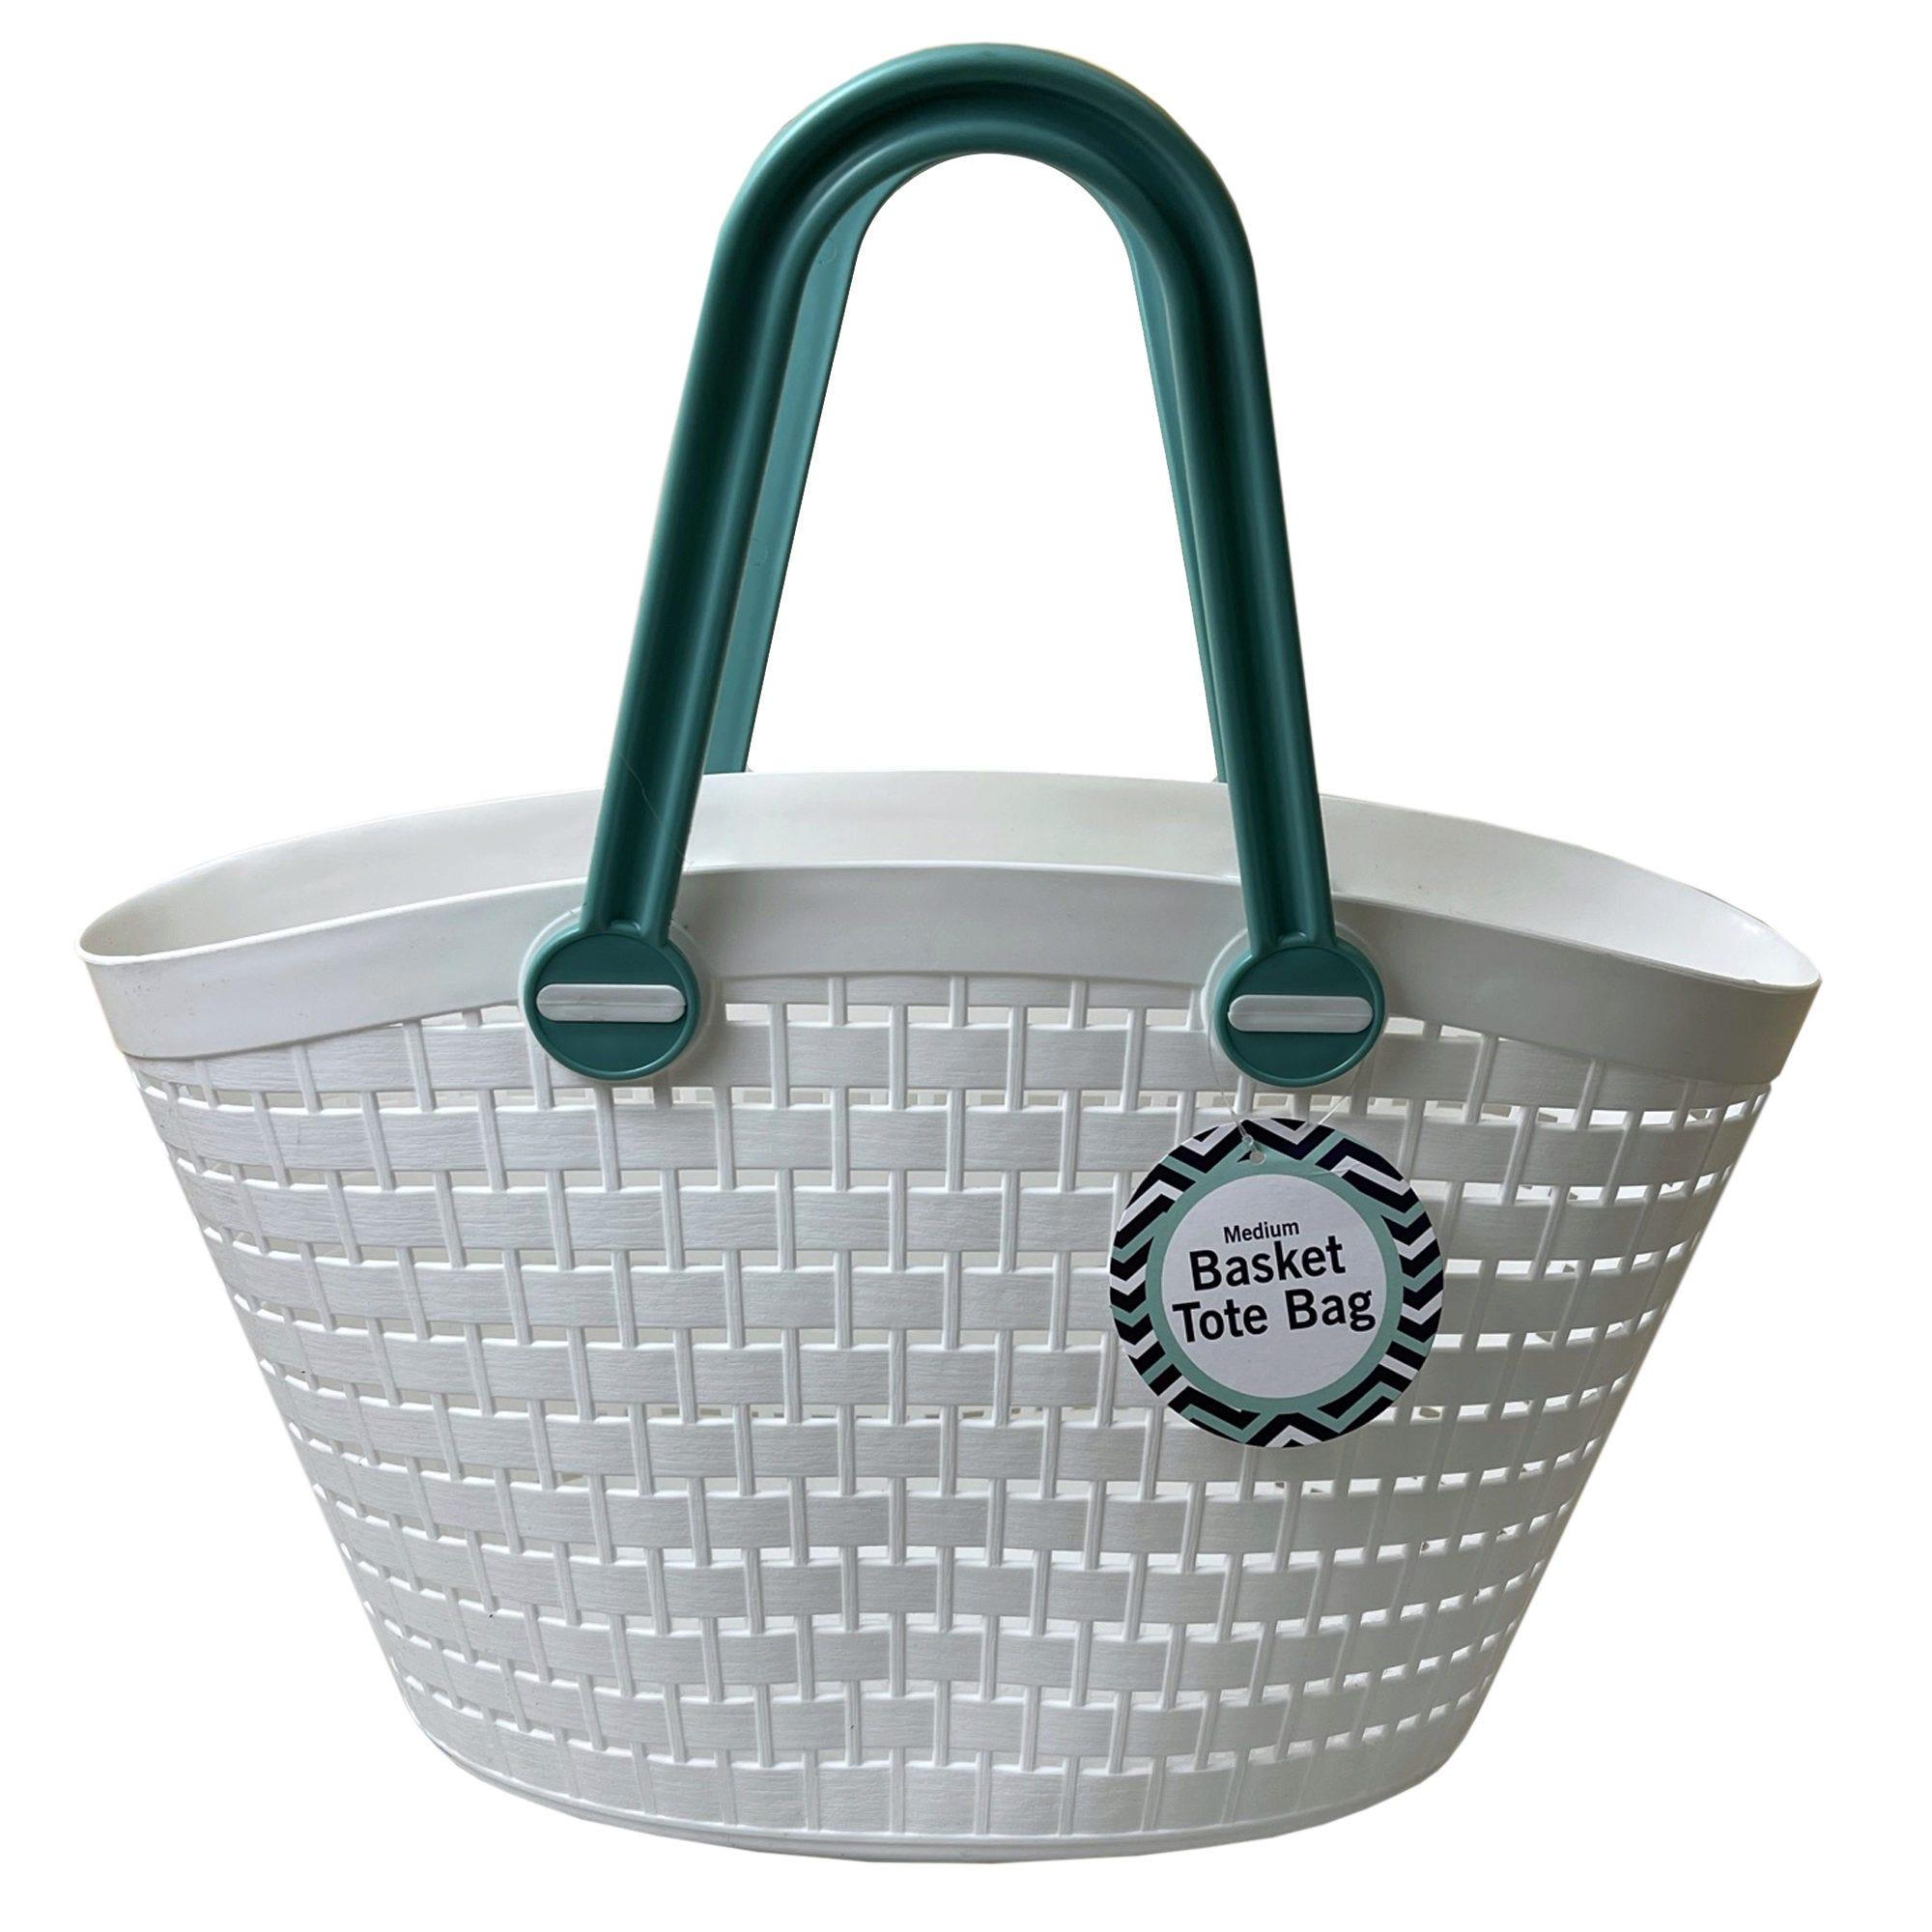 Medium Basket Tote BAG - Qty 4